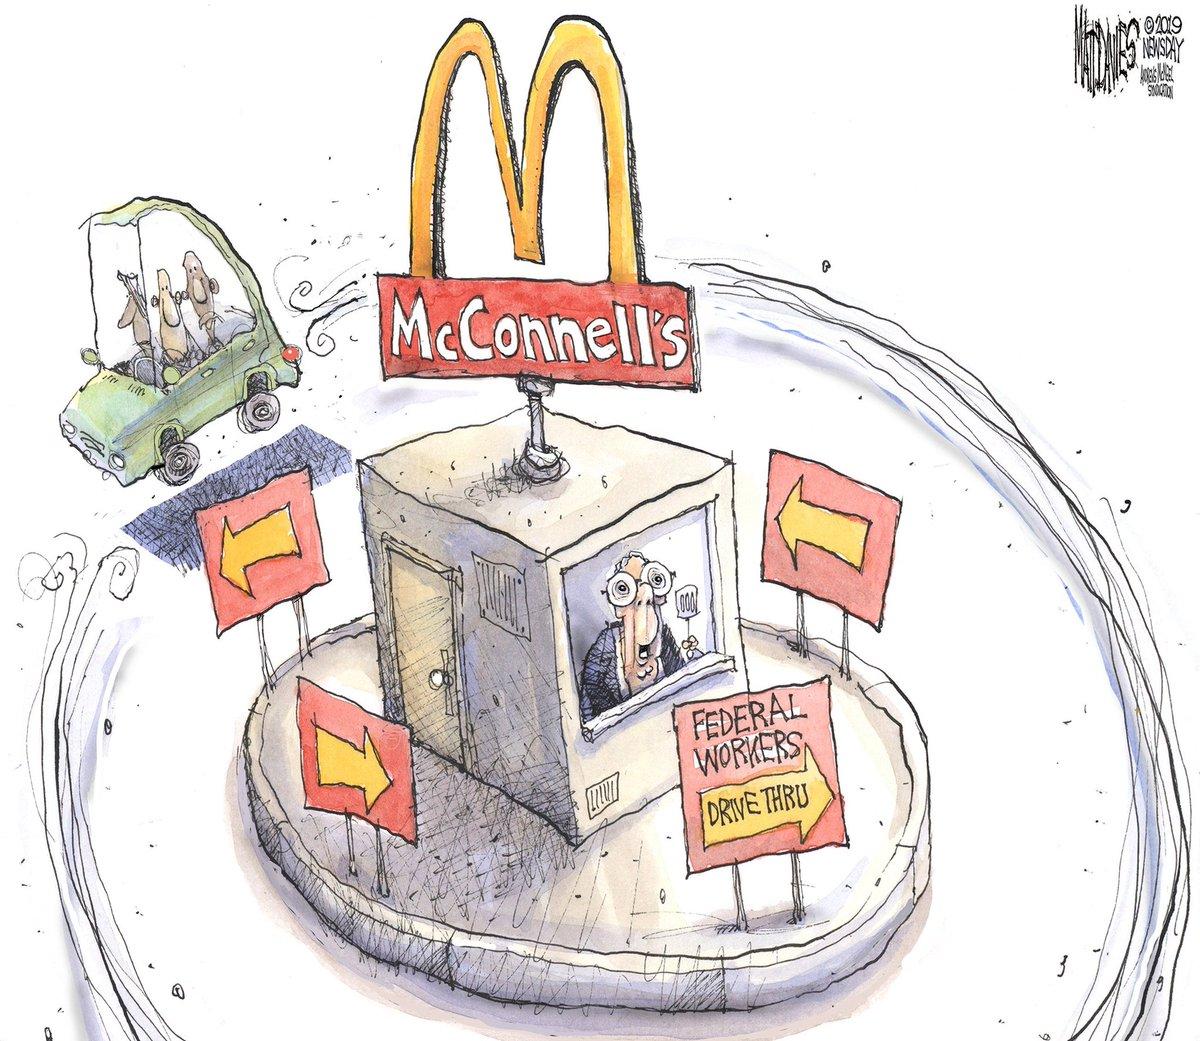 #WheresMitch?  #TheresMitch, giving #FederalEmployees the run around to protect Donald.  #TrumpShutdown